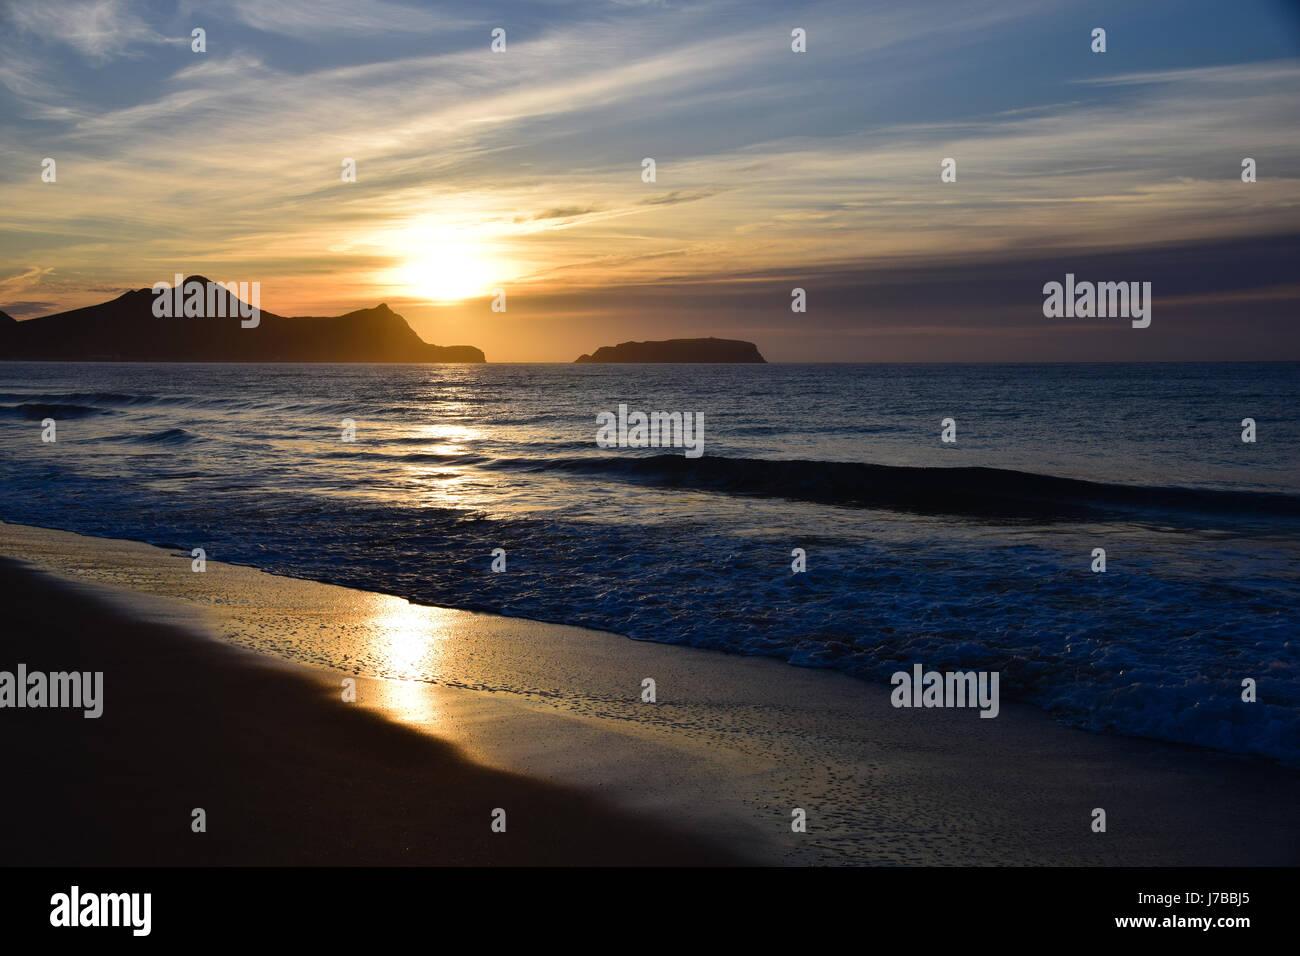 Sunrise over the Atlantic Ocean from Porto Santo beach - Stock Image